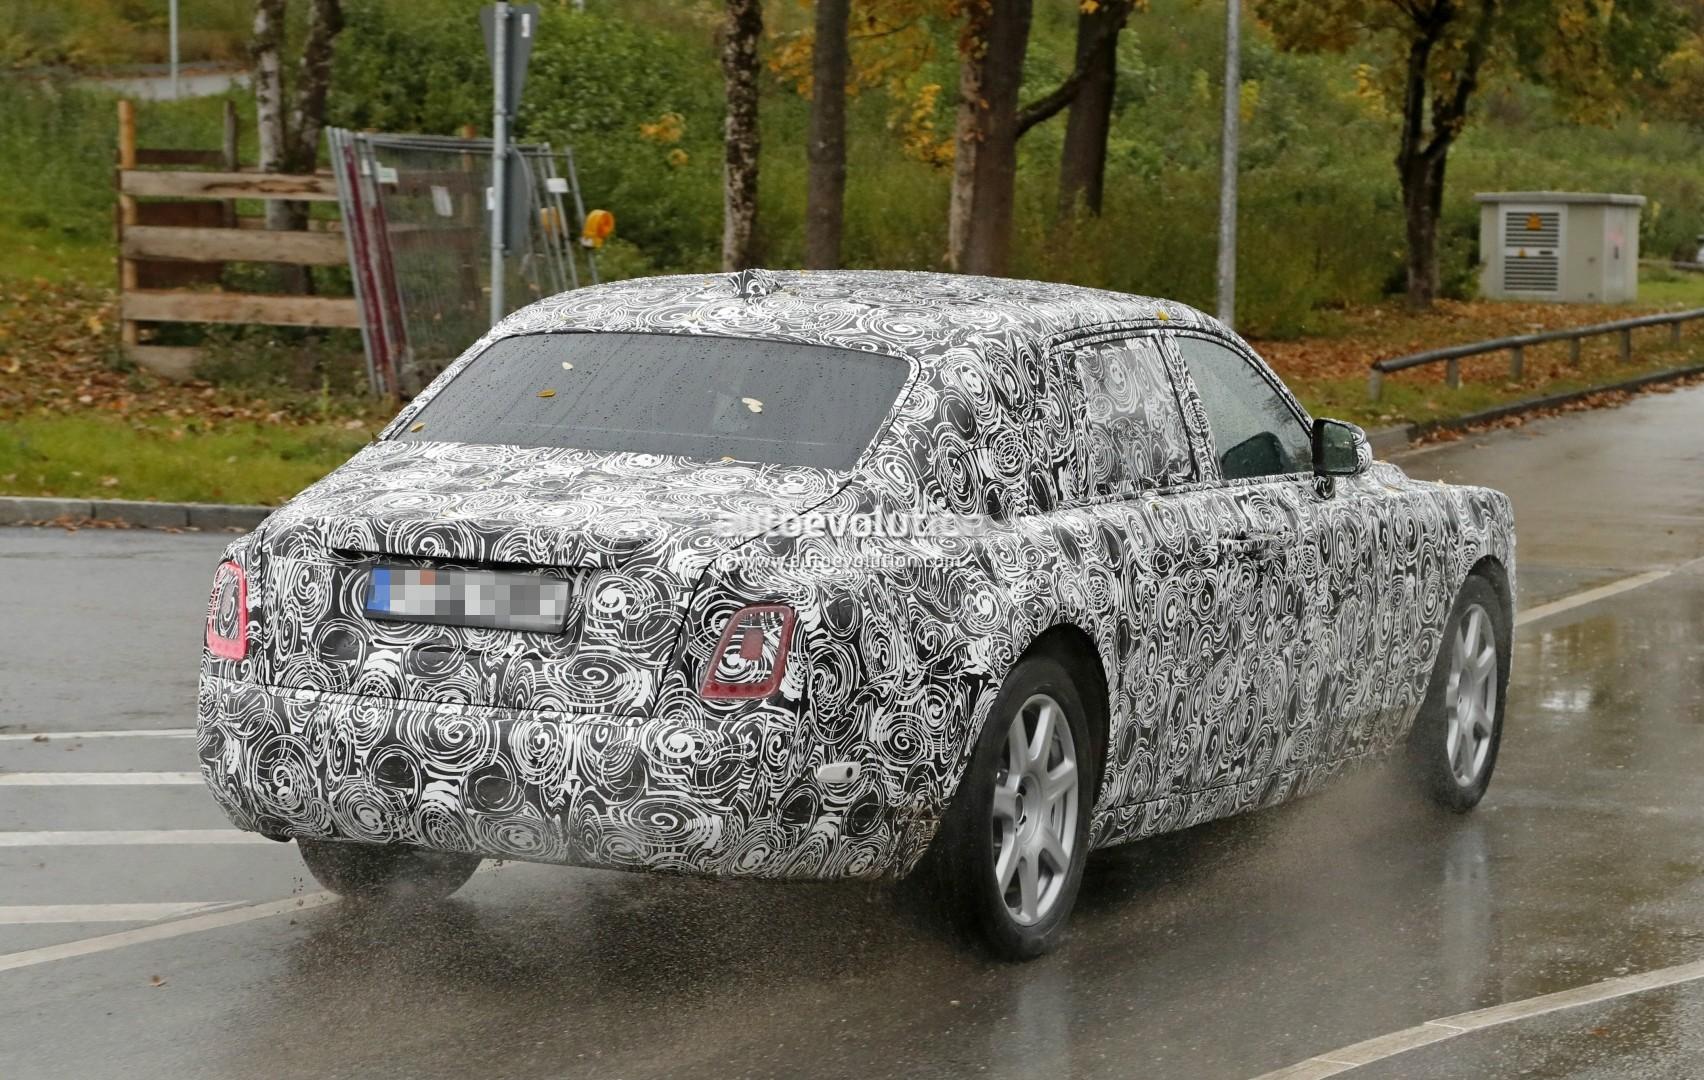 2017 - [Rolls Royce] Phantom - Page 2 2018-rolls-royce-phantom-prototype-partially-reveals-new-headlights-taillights_9